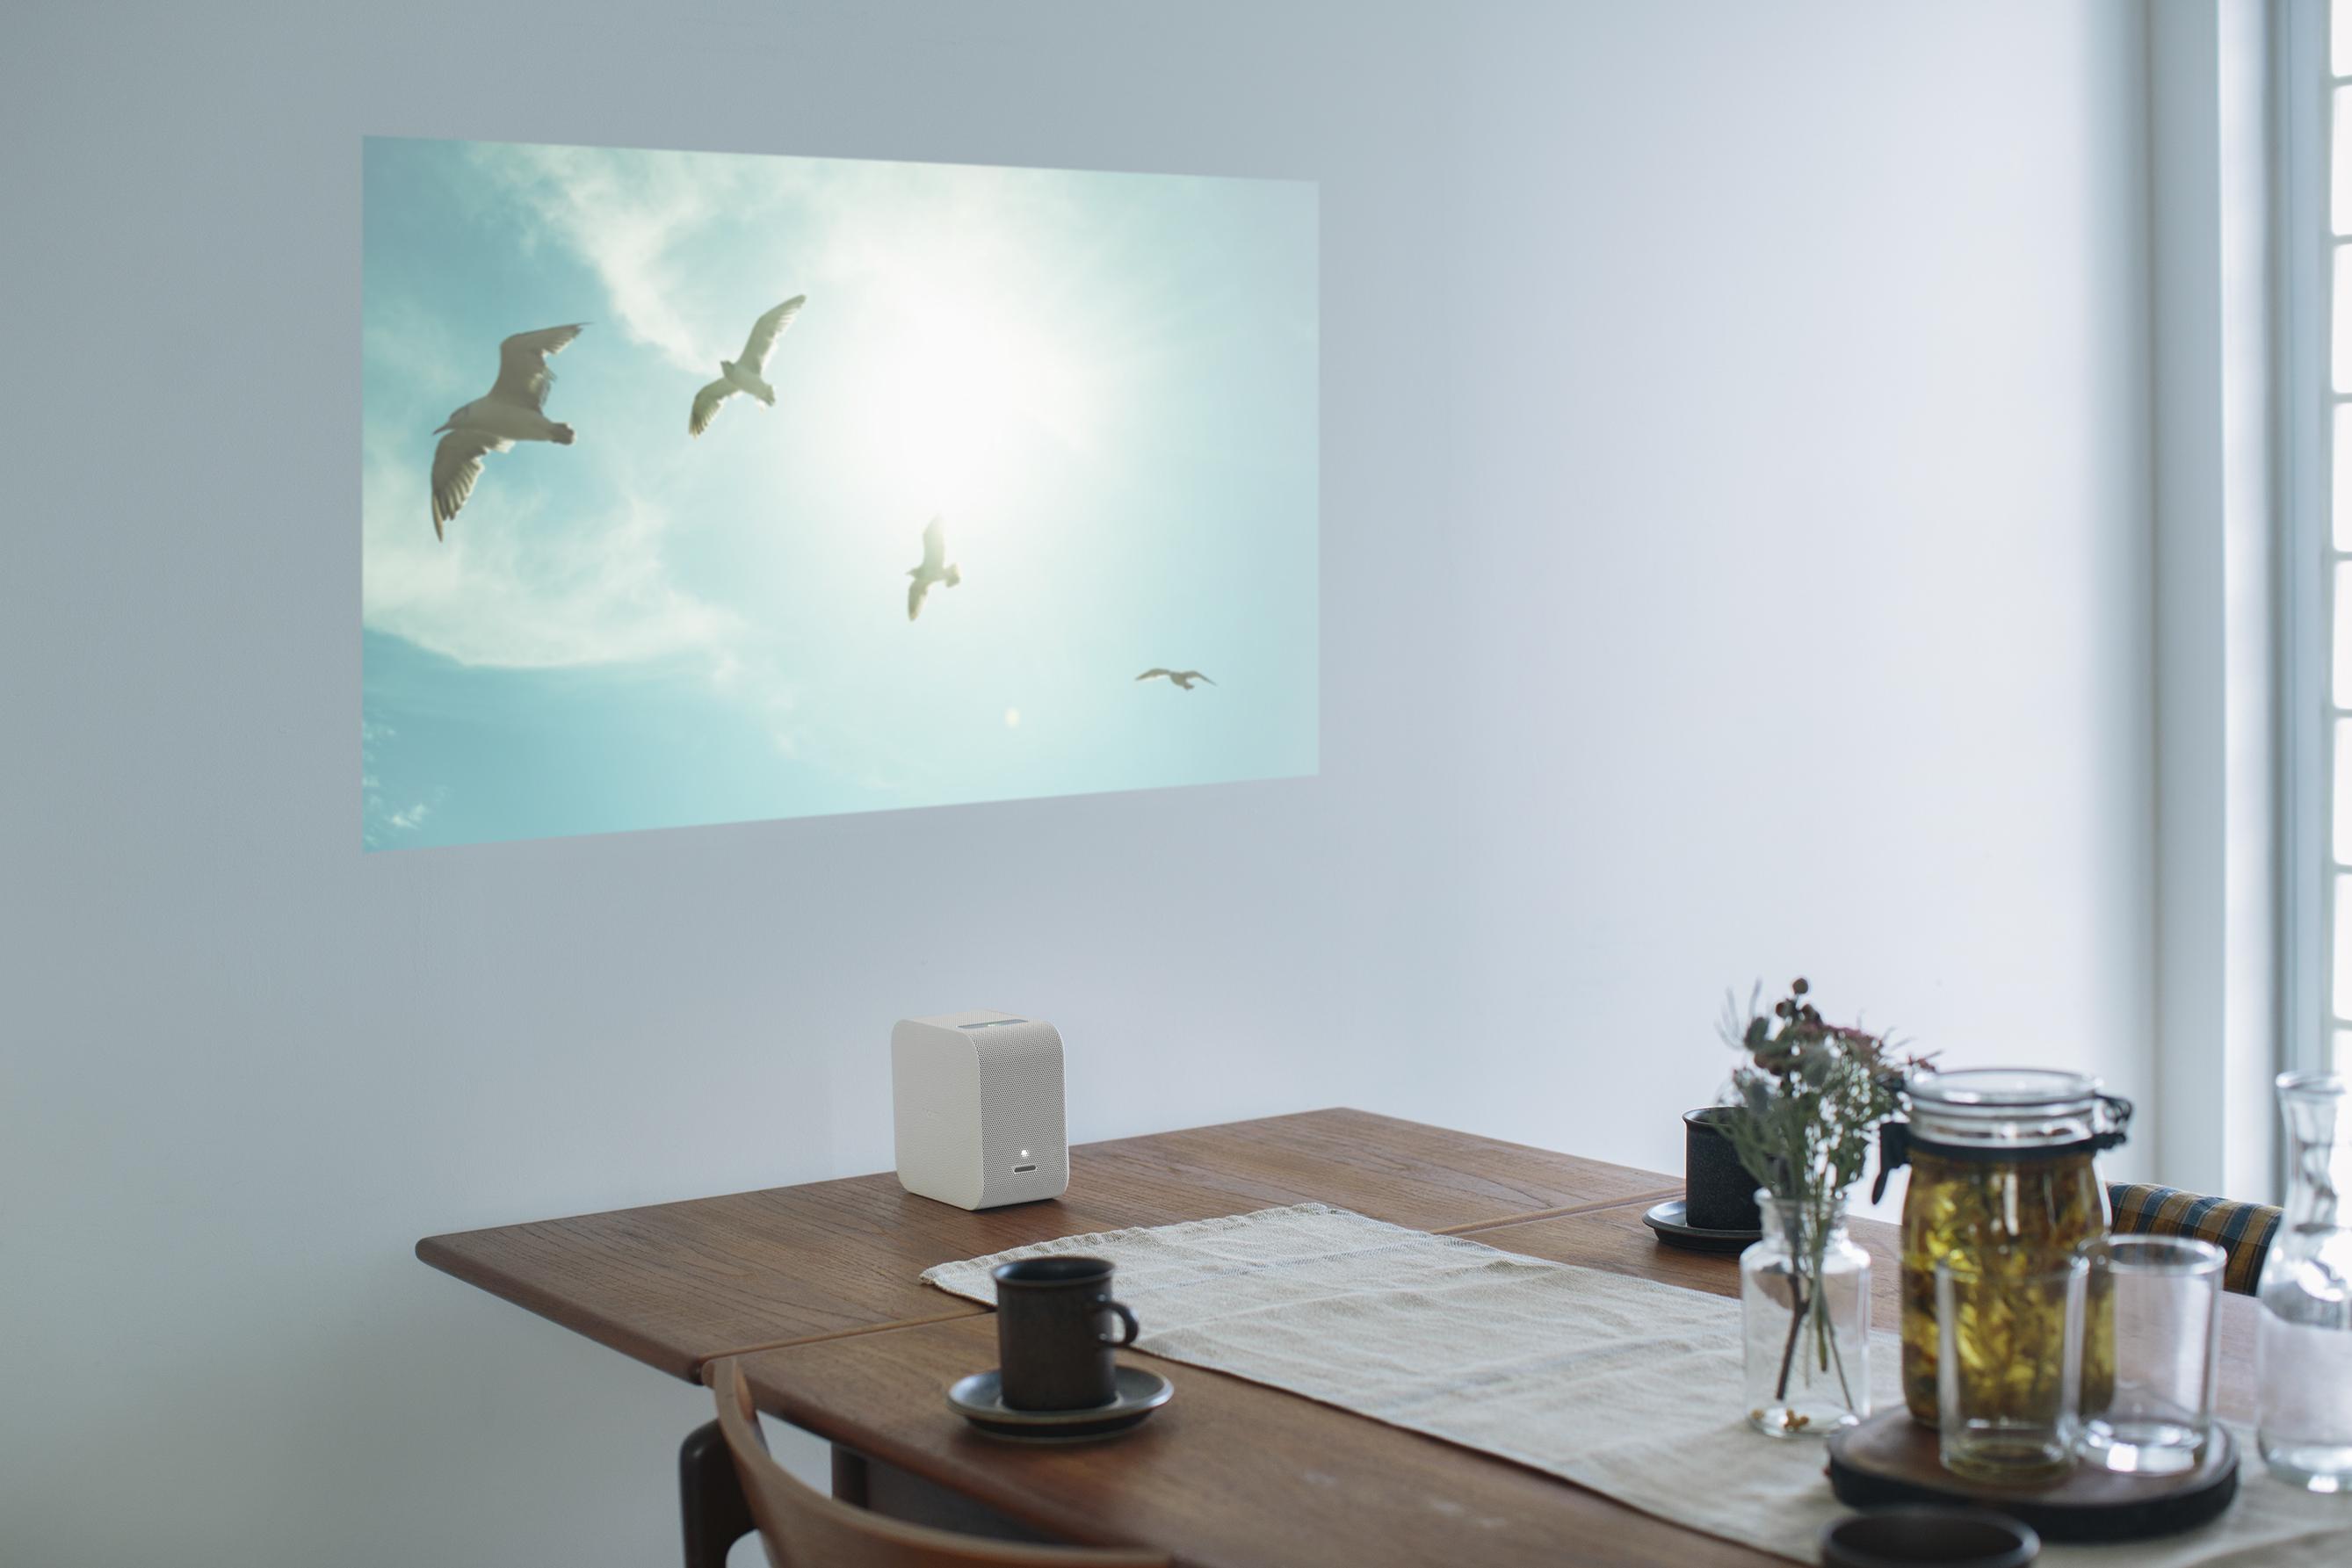 portable-ultra-short-throw-projector_2